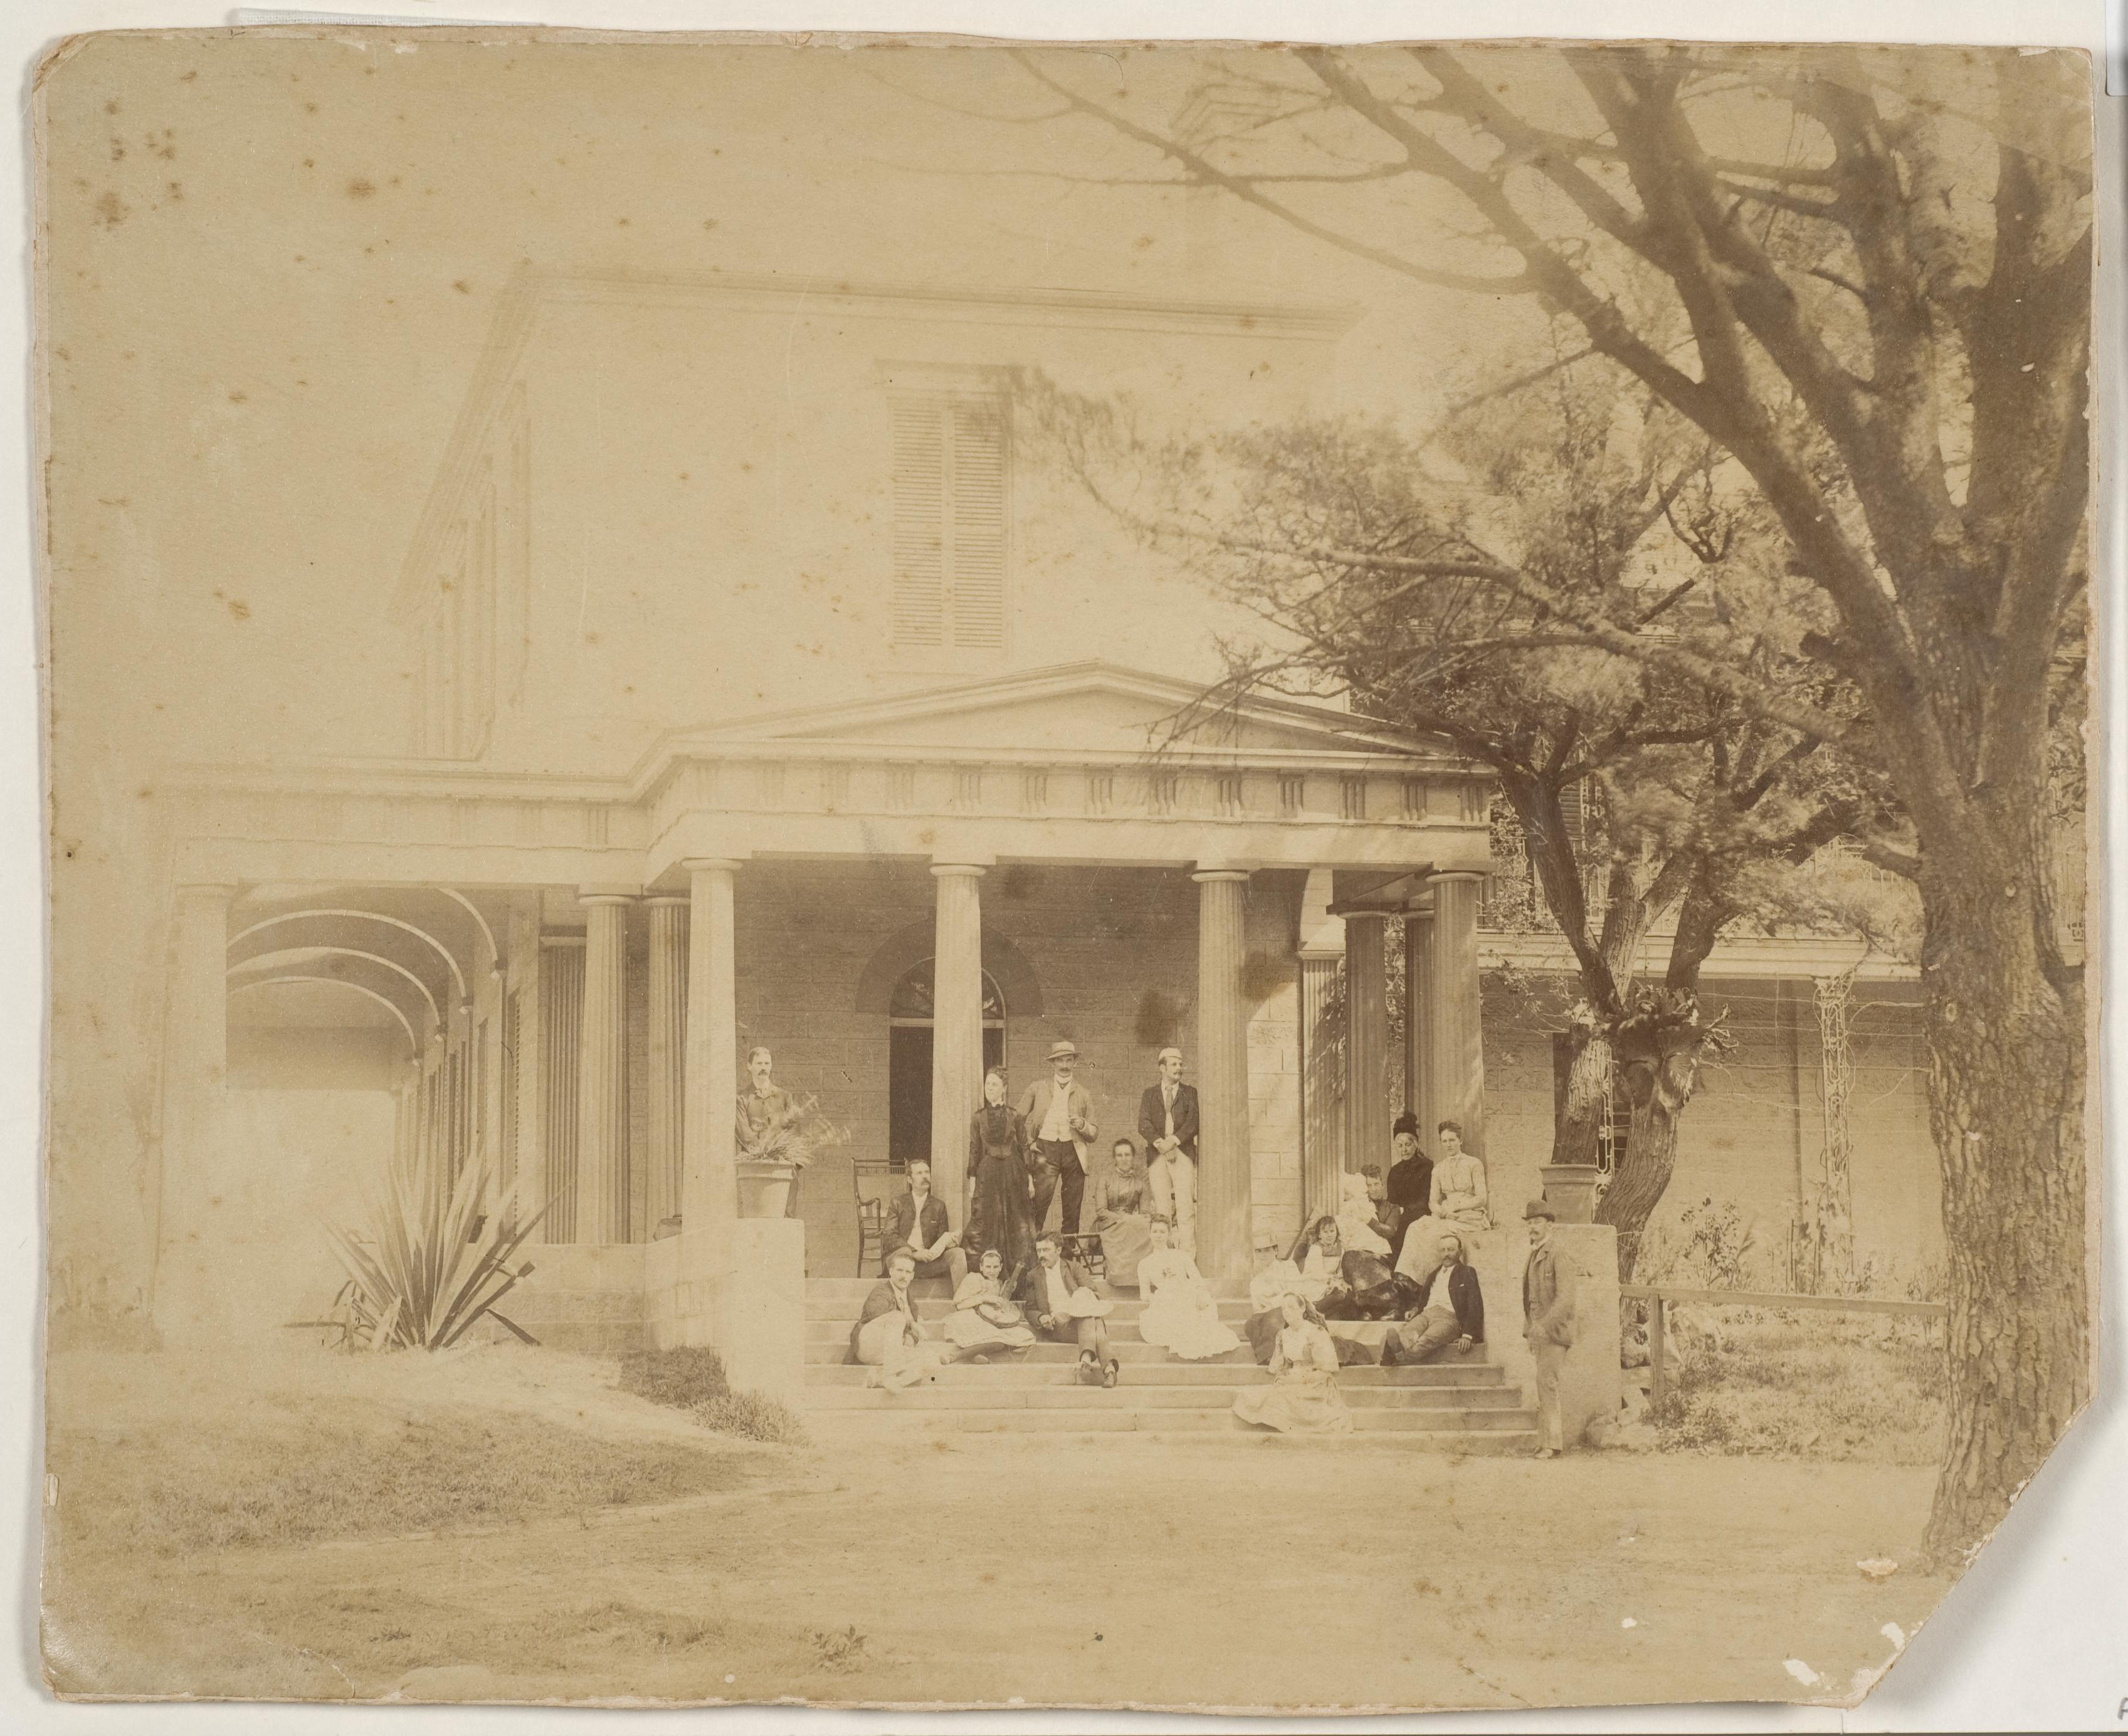 Pechey family, Craigend, Darlinghurst, ca. 1882-1885 / photographer unkown